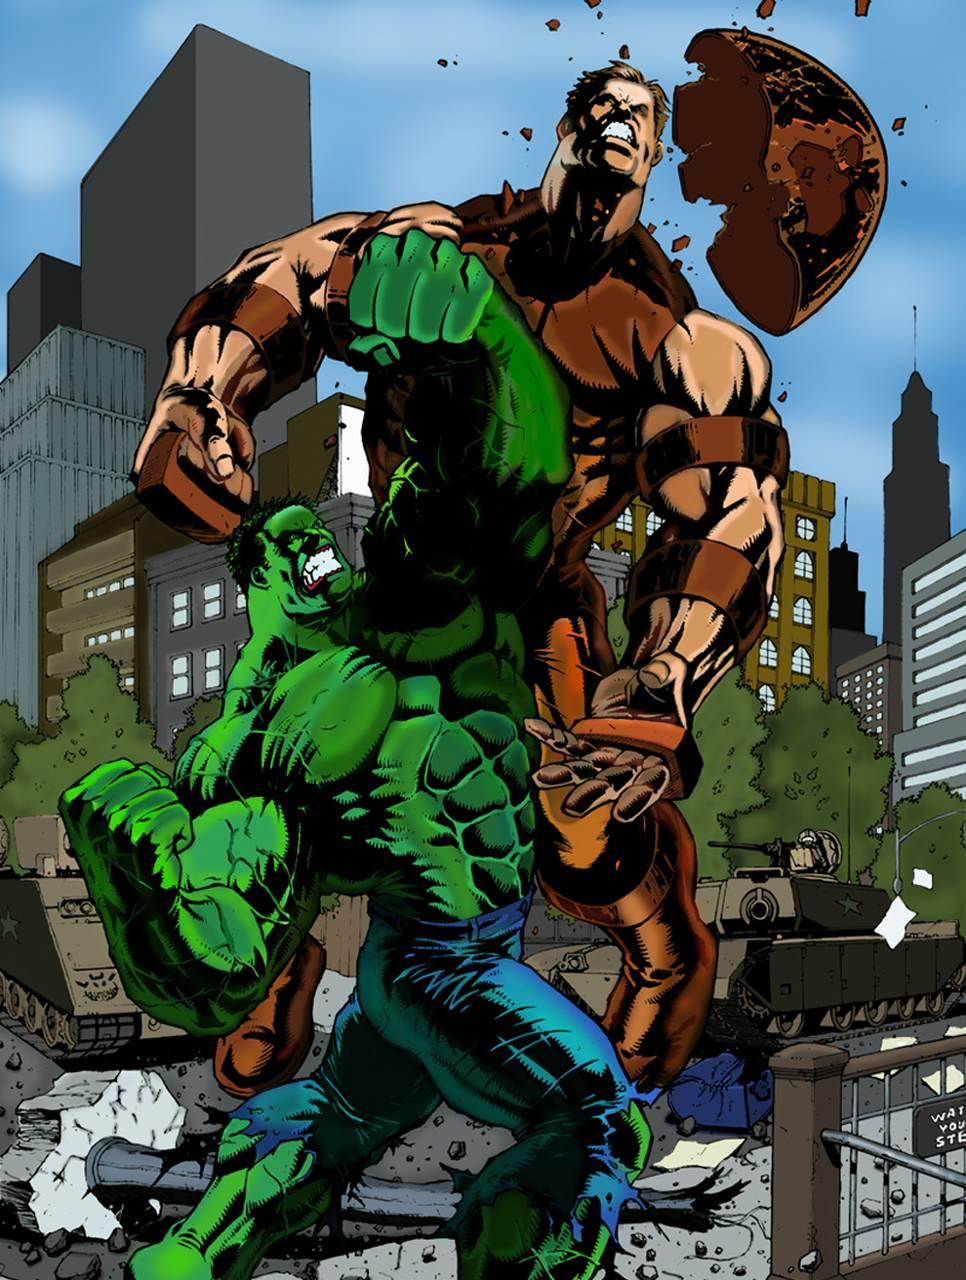 Hulk Vs Juggernaut Wallpaper By Luigyh 88 Free On Zedge